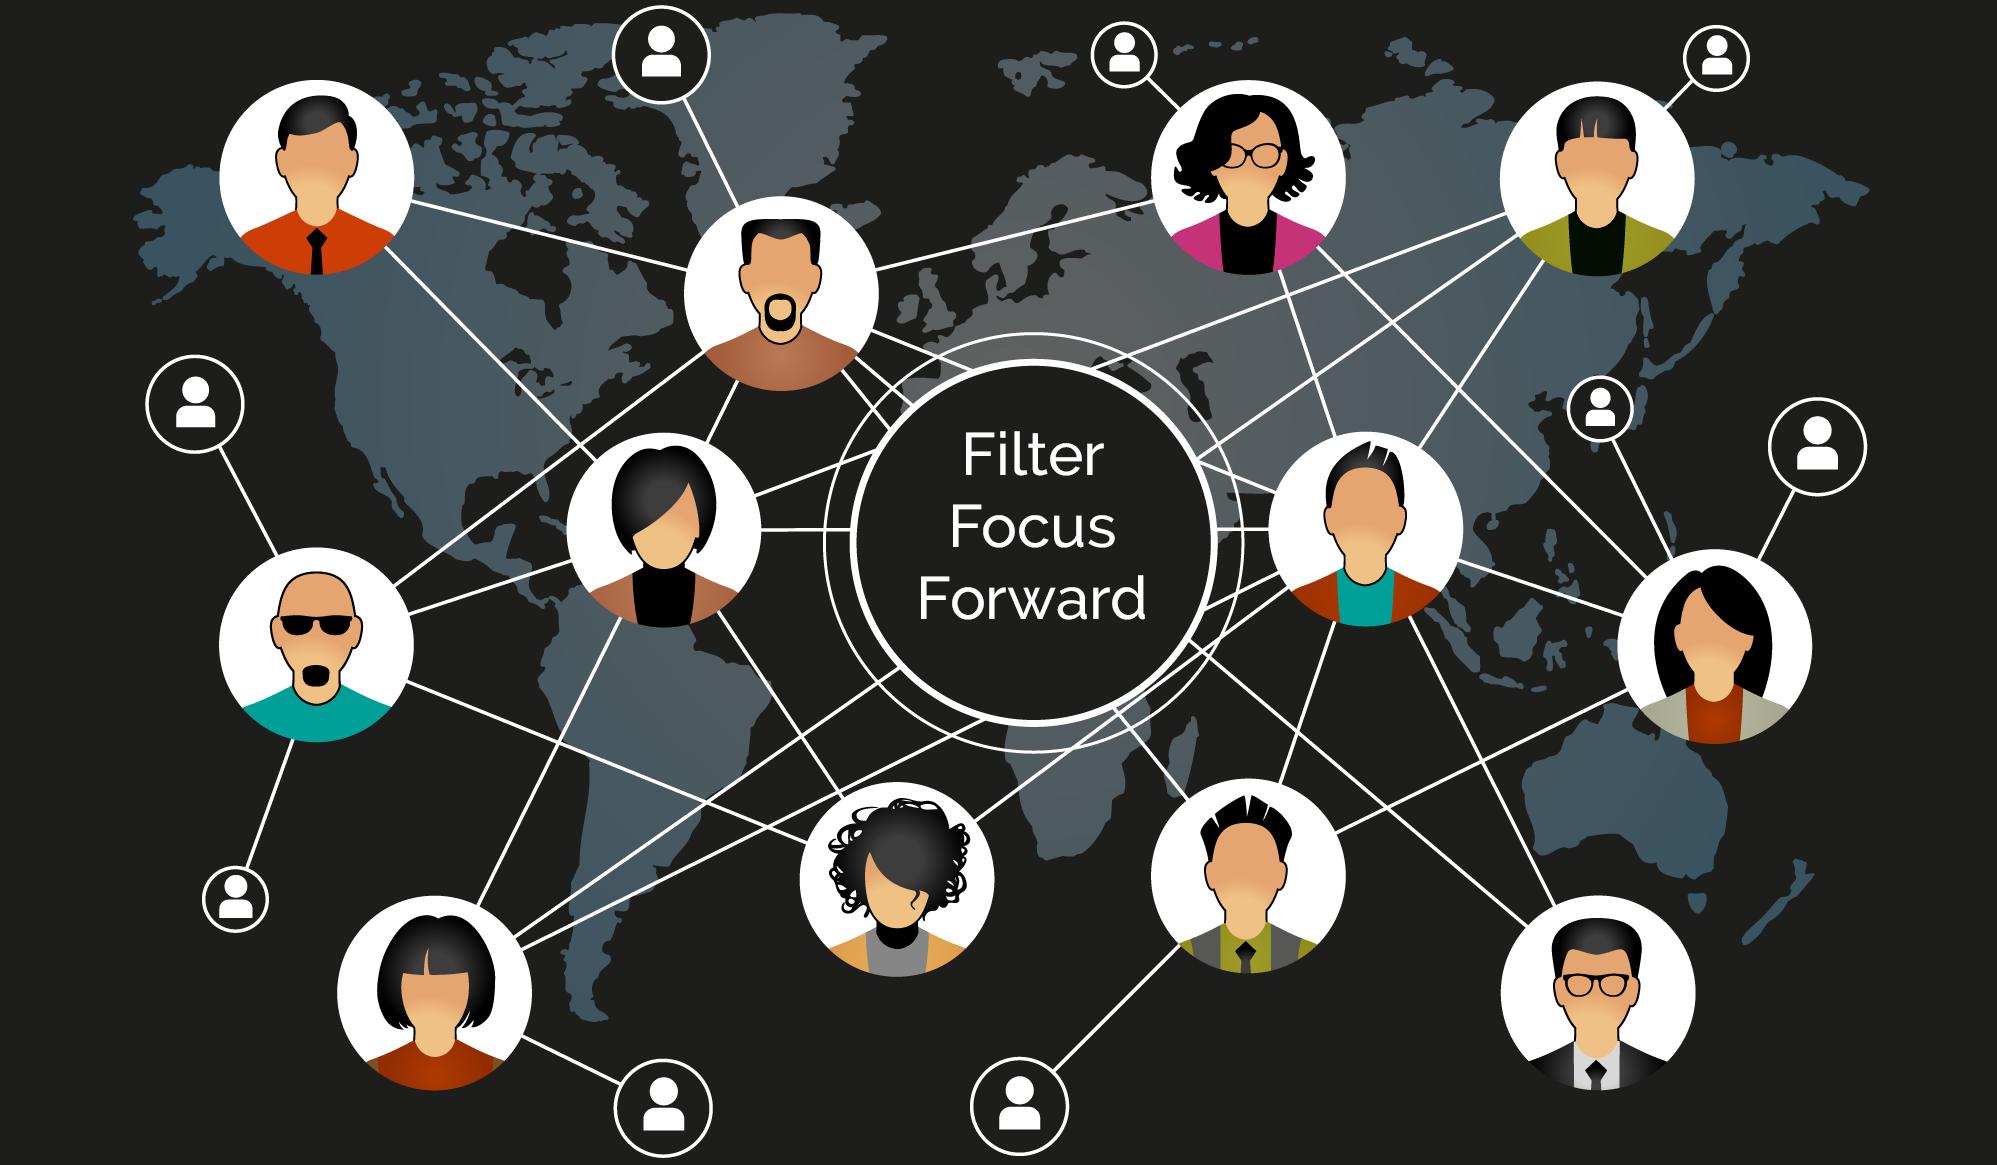 Filter_Focus_Forward